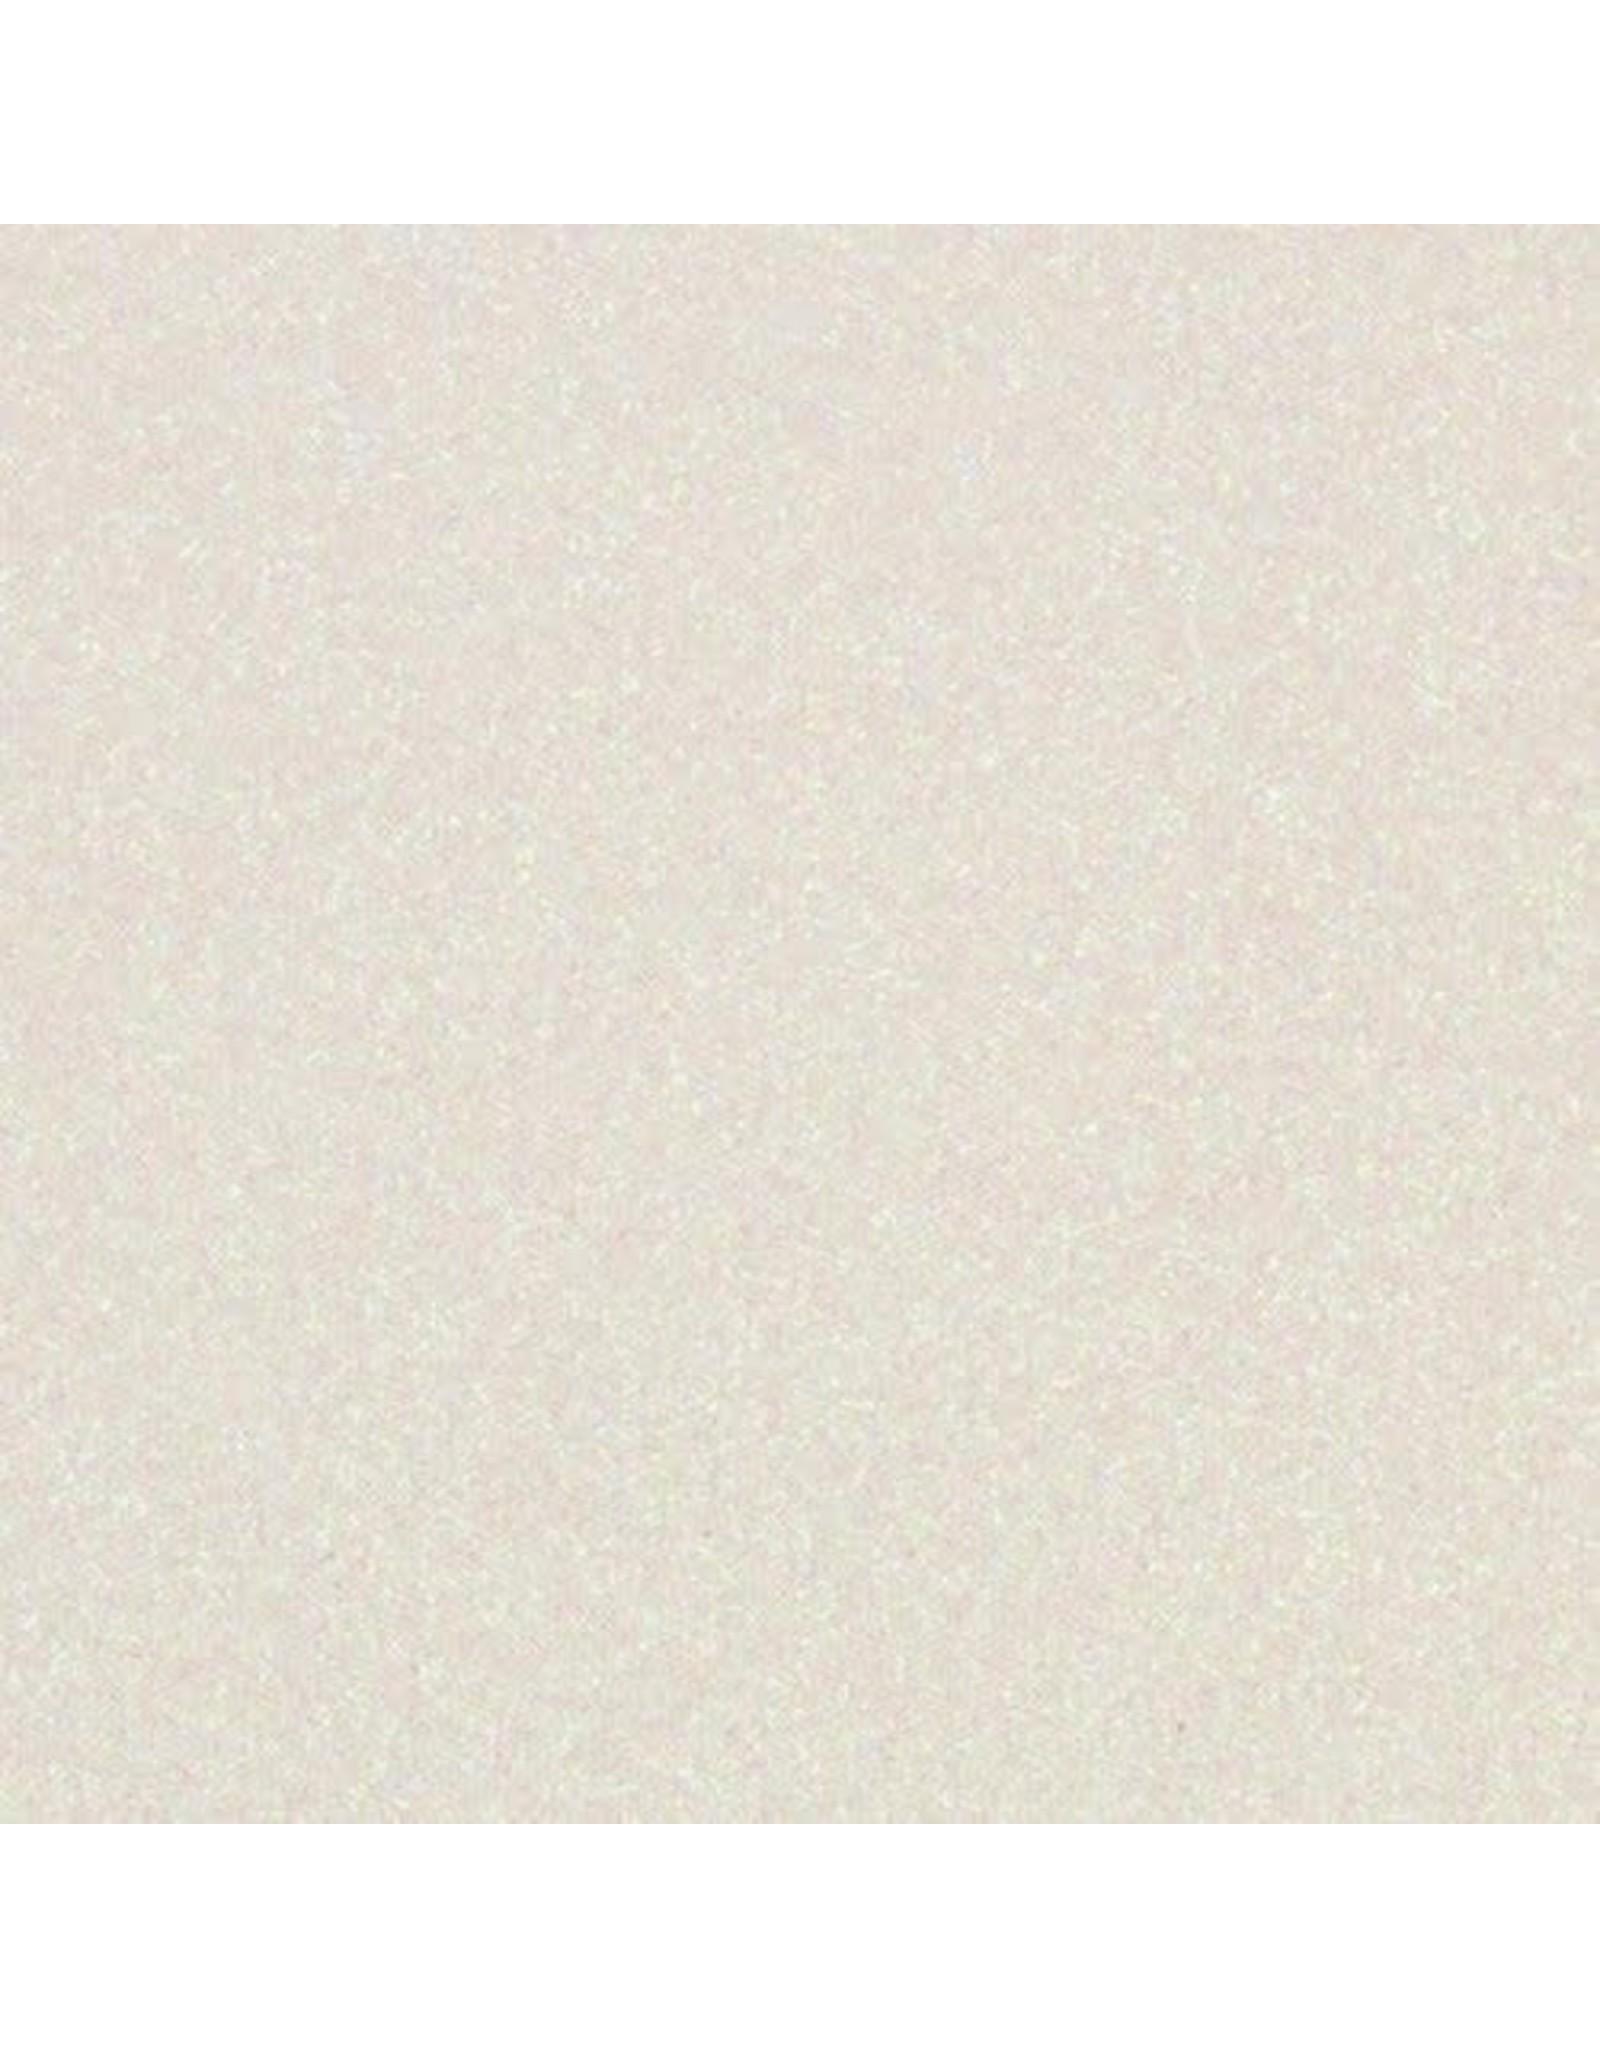 Tonic Studio Sugar Crystal - A4 Glitter Card